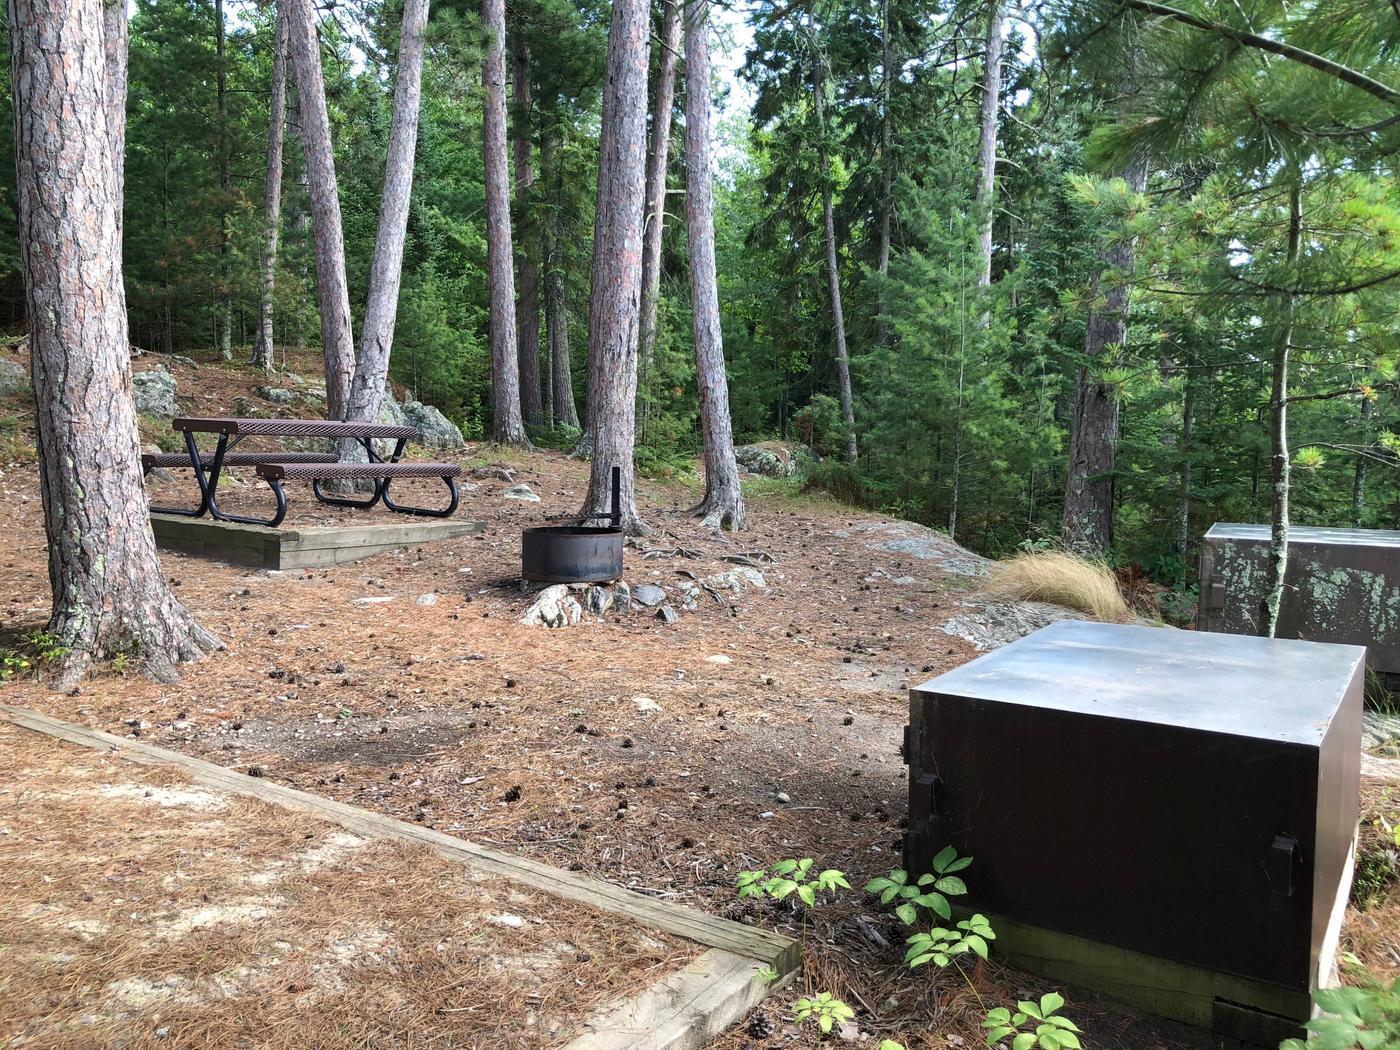 N62 - Sexton IslandView of campsite